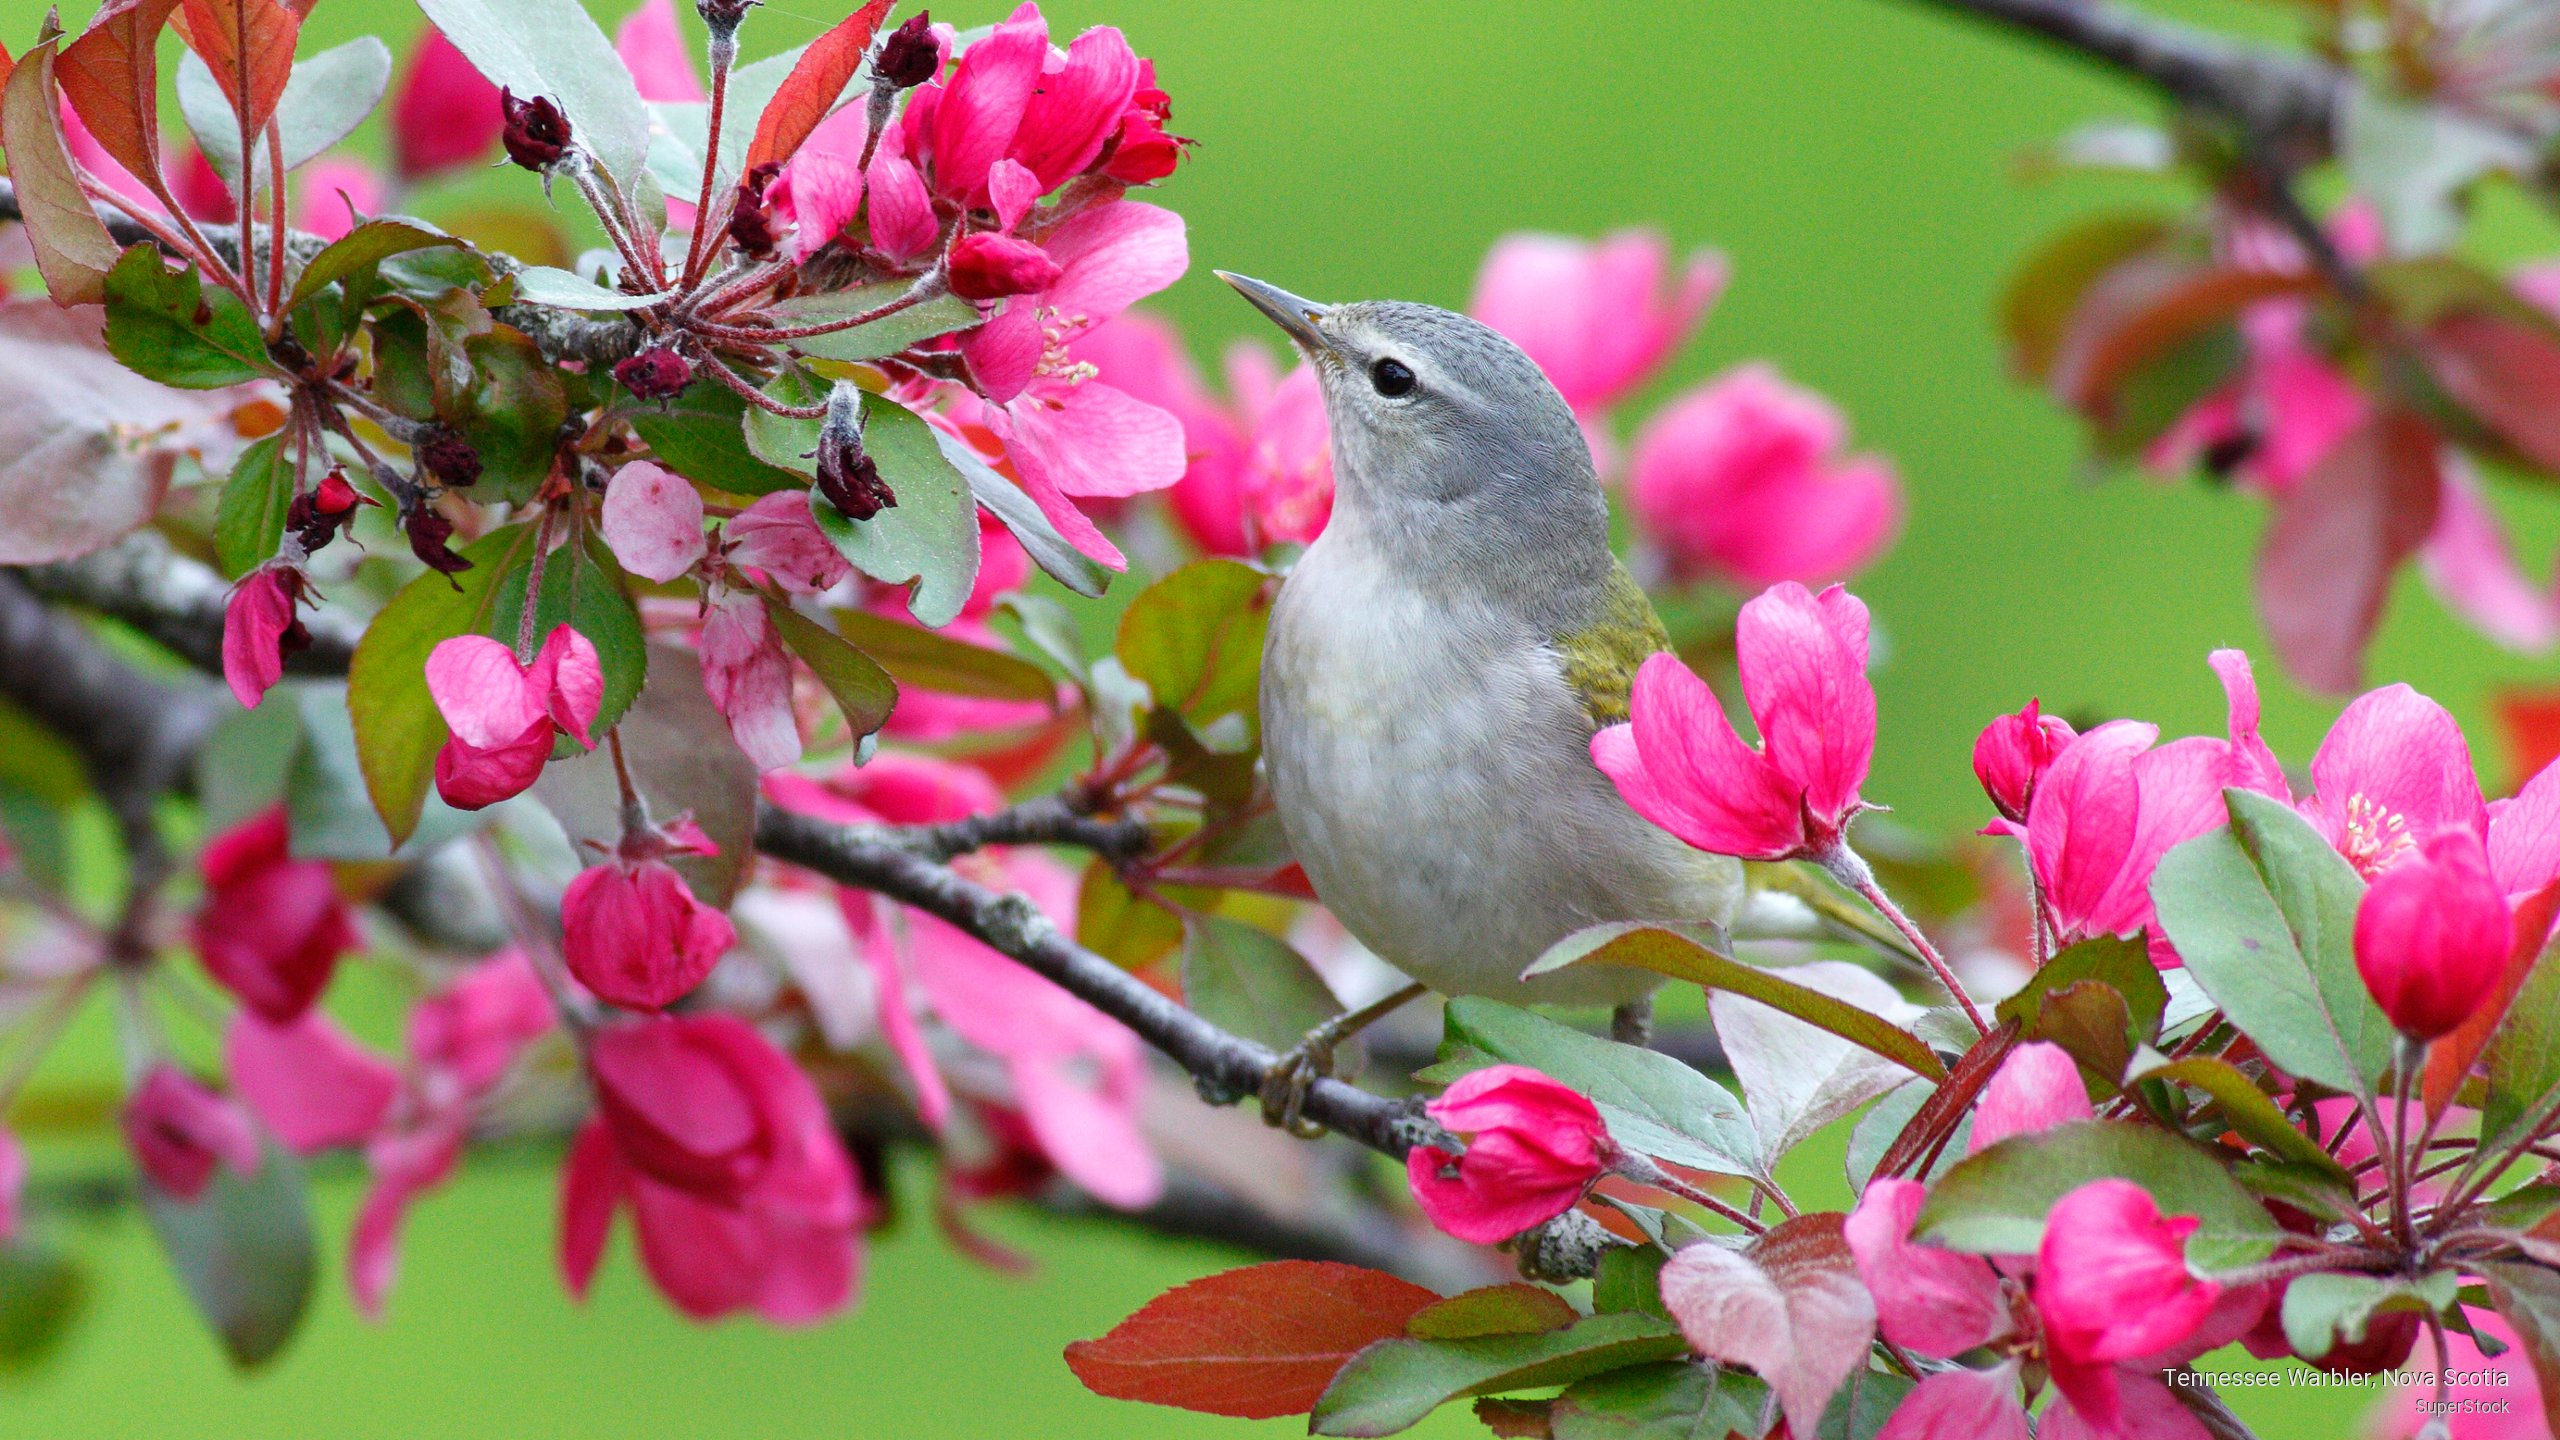 Tennessee Warbler, Nova Scotia